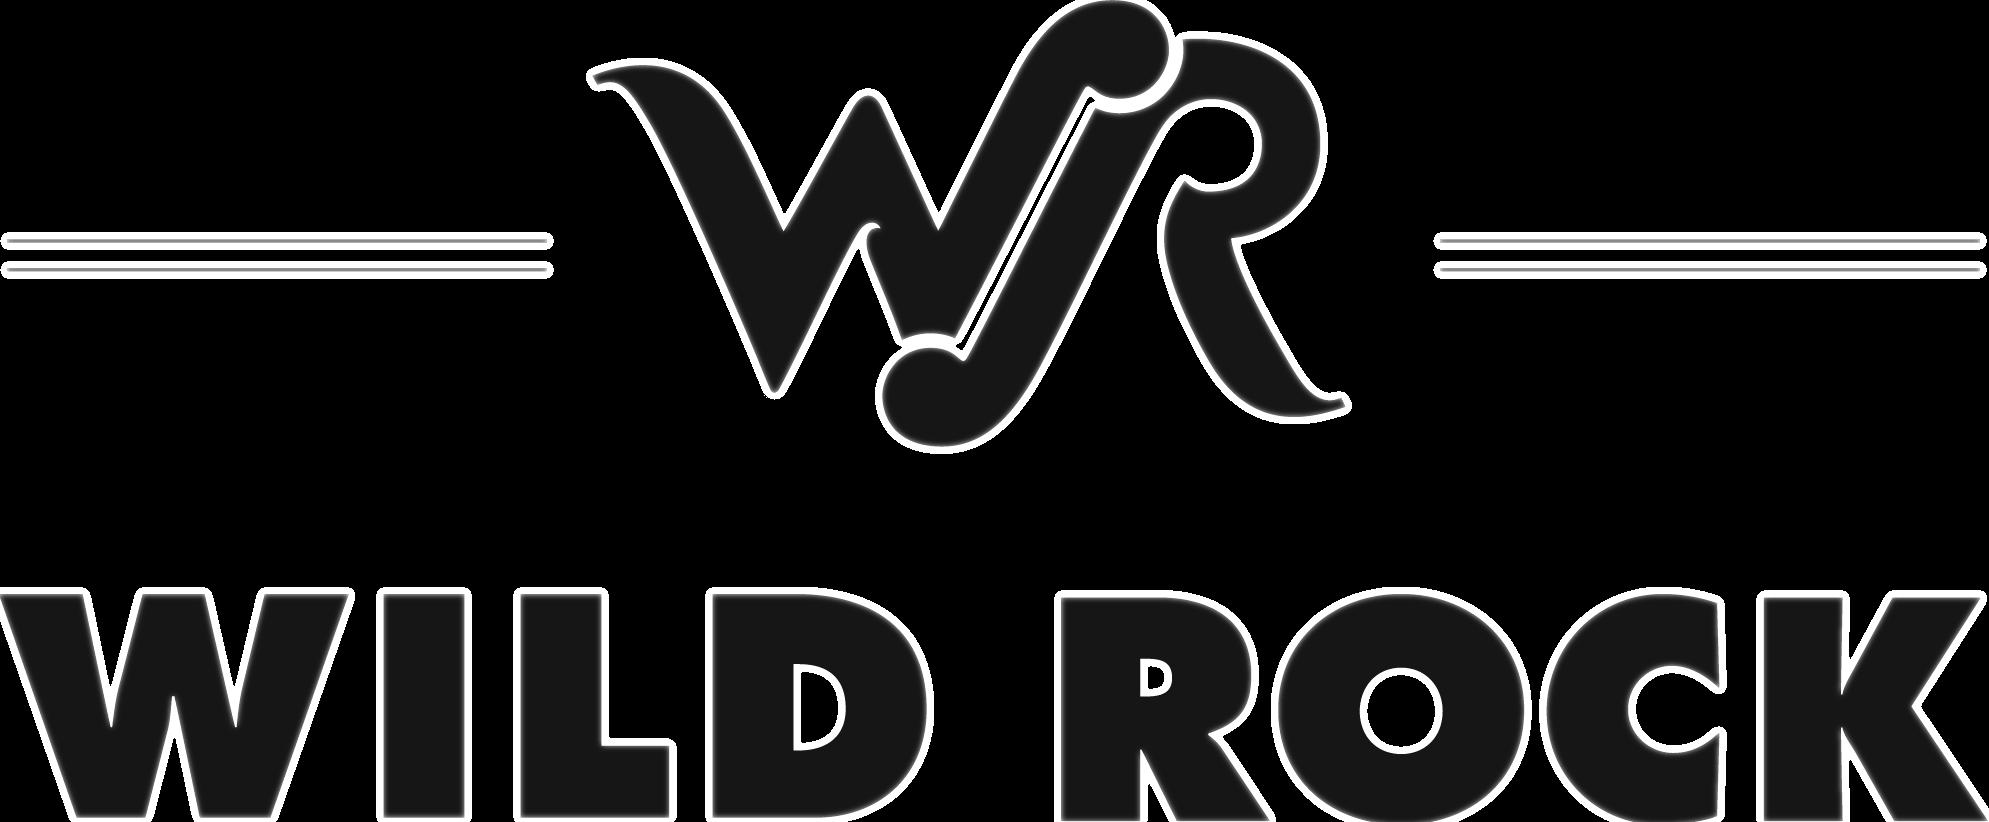 Wild Rock Wine Company